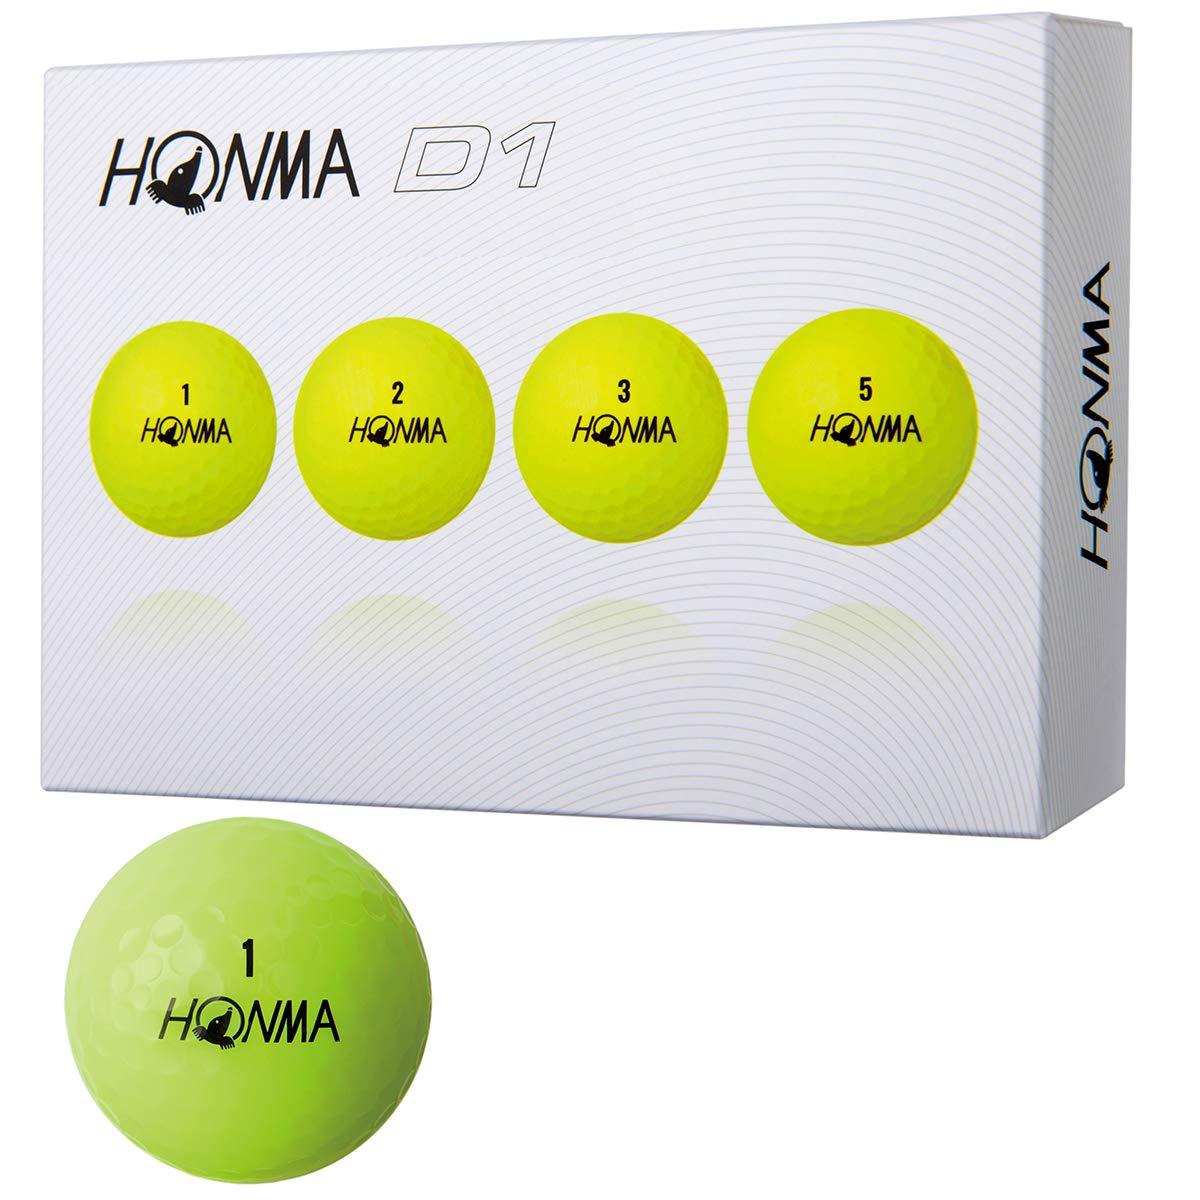 Honma Golf Golf Ball New D1 Yellow 5 Dozens Japan Import